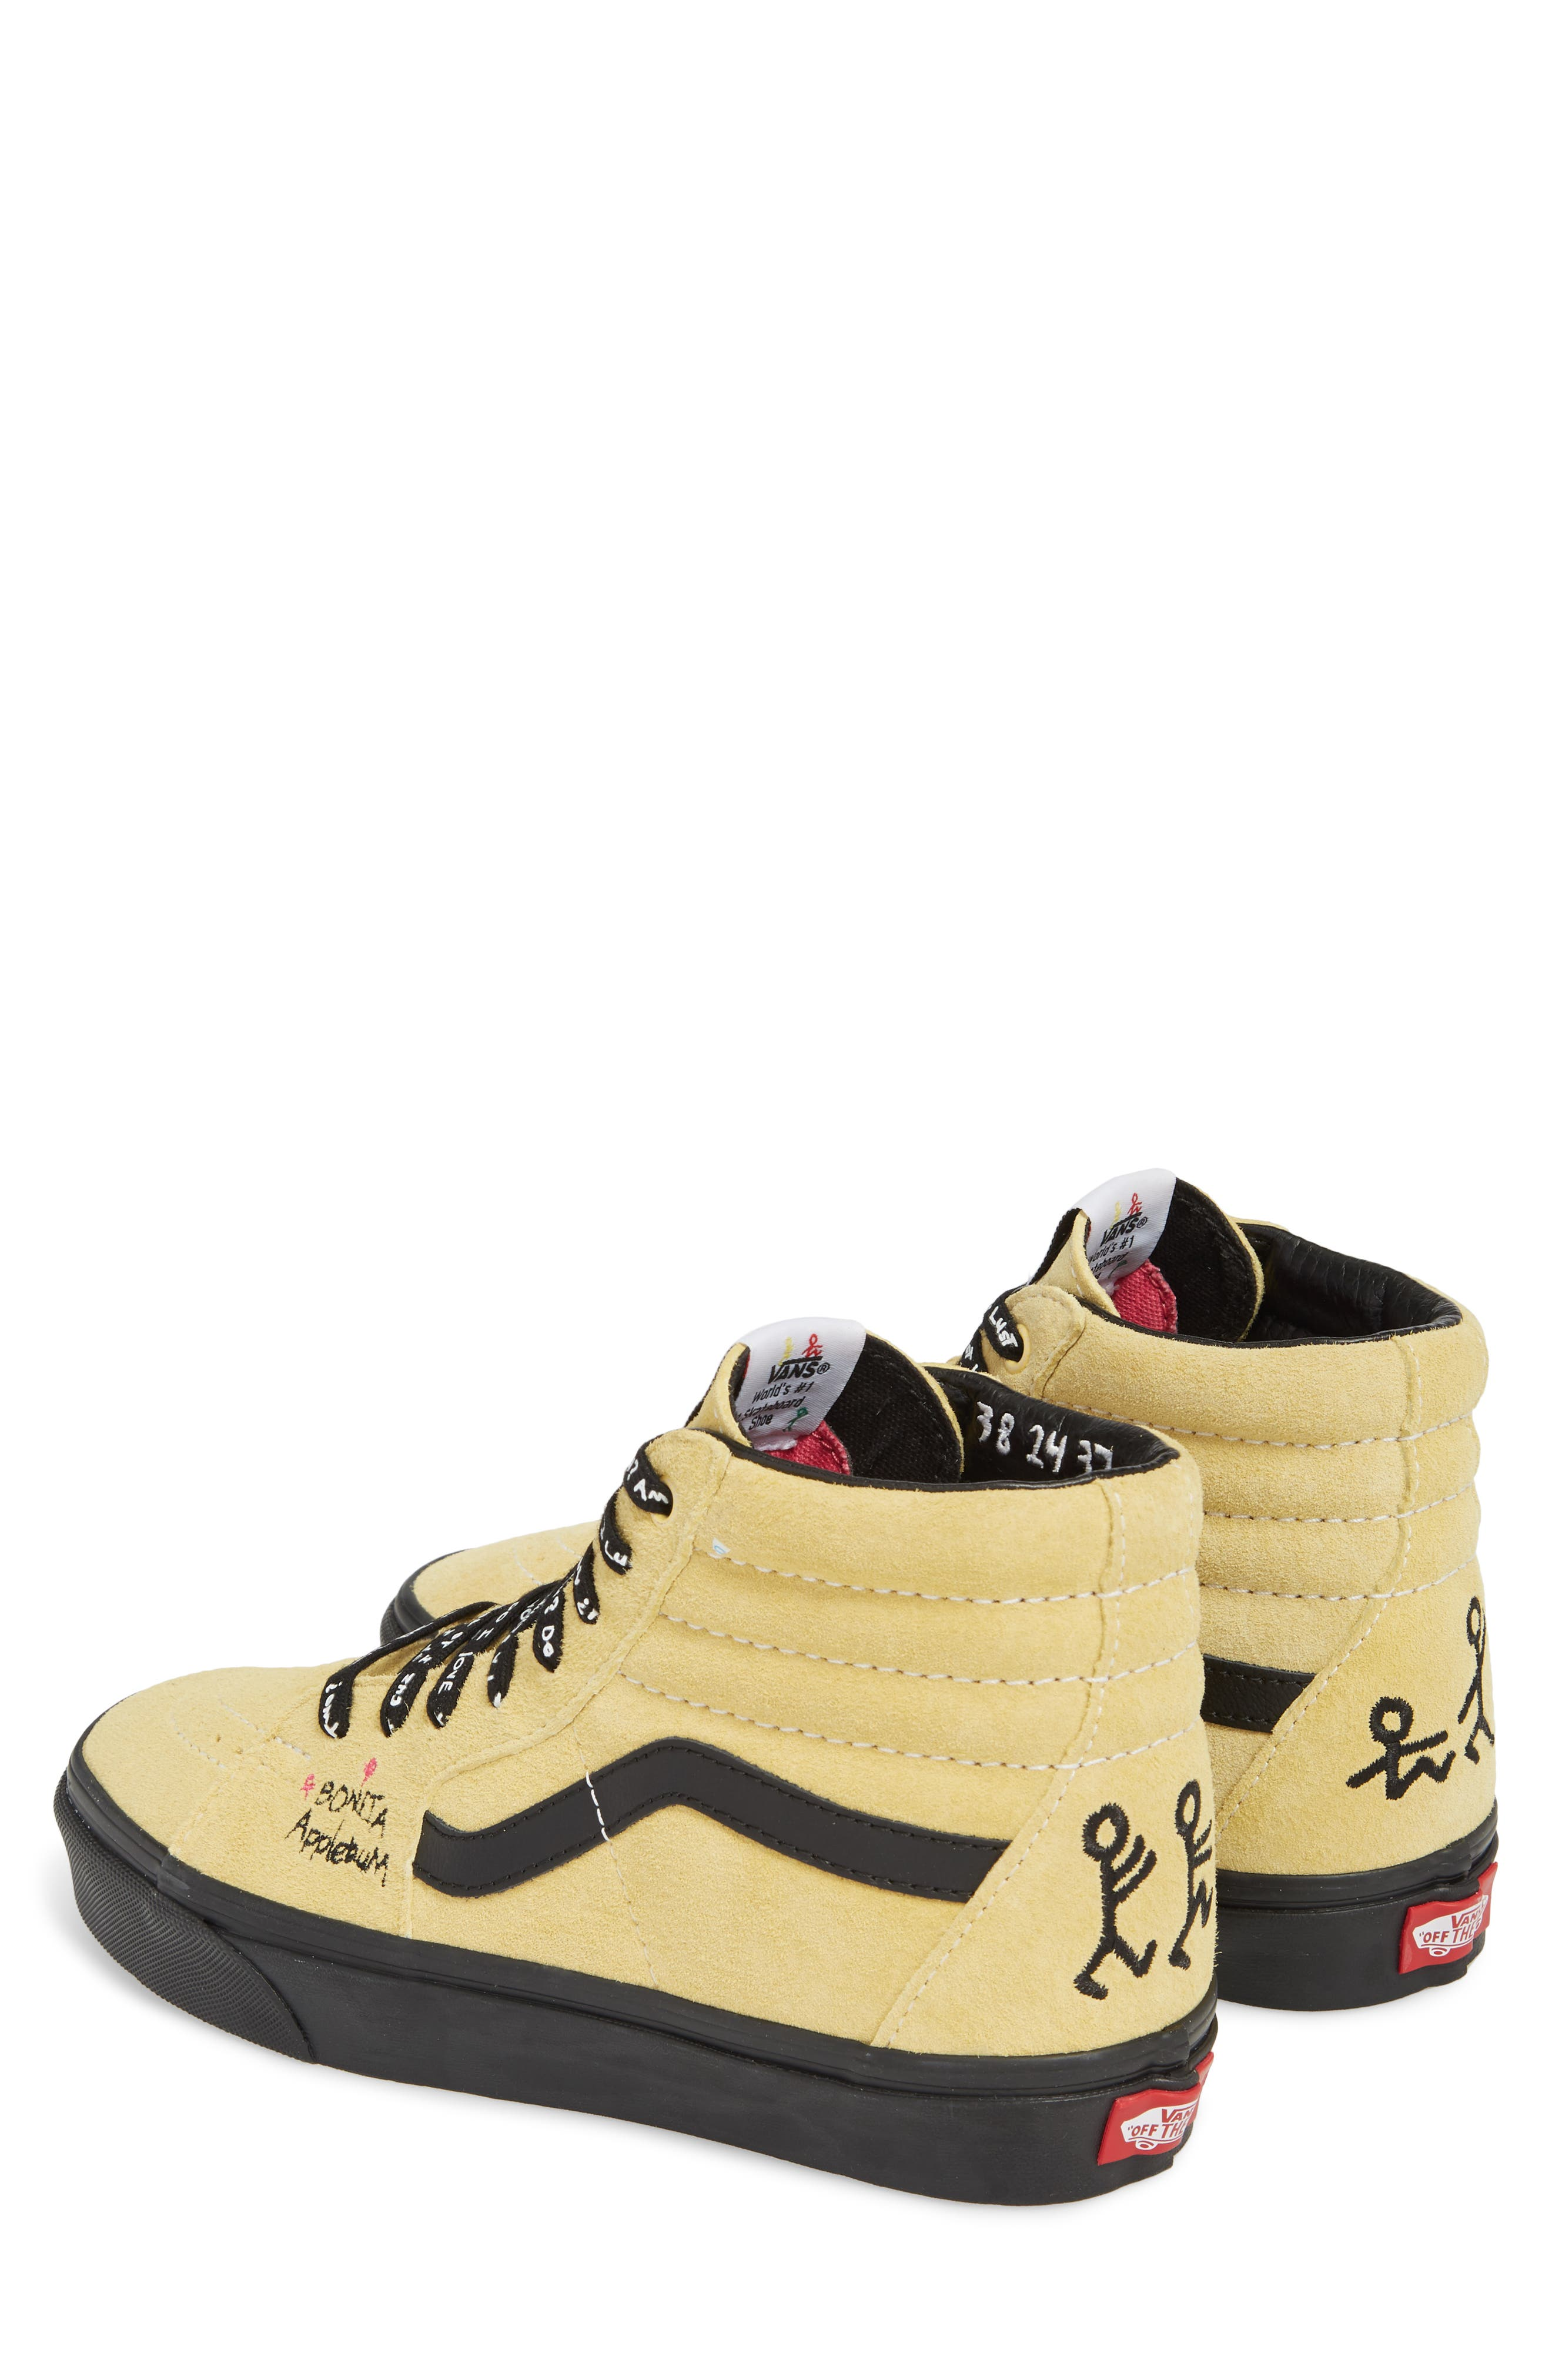 ATCQ Sk8-Hi Sneaker,                             Alternate thumbnail 2, color,                             Mellow Yellow/ Spectra Yellow